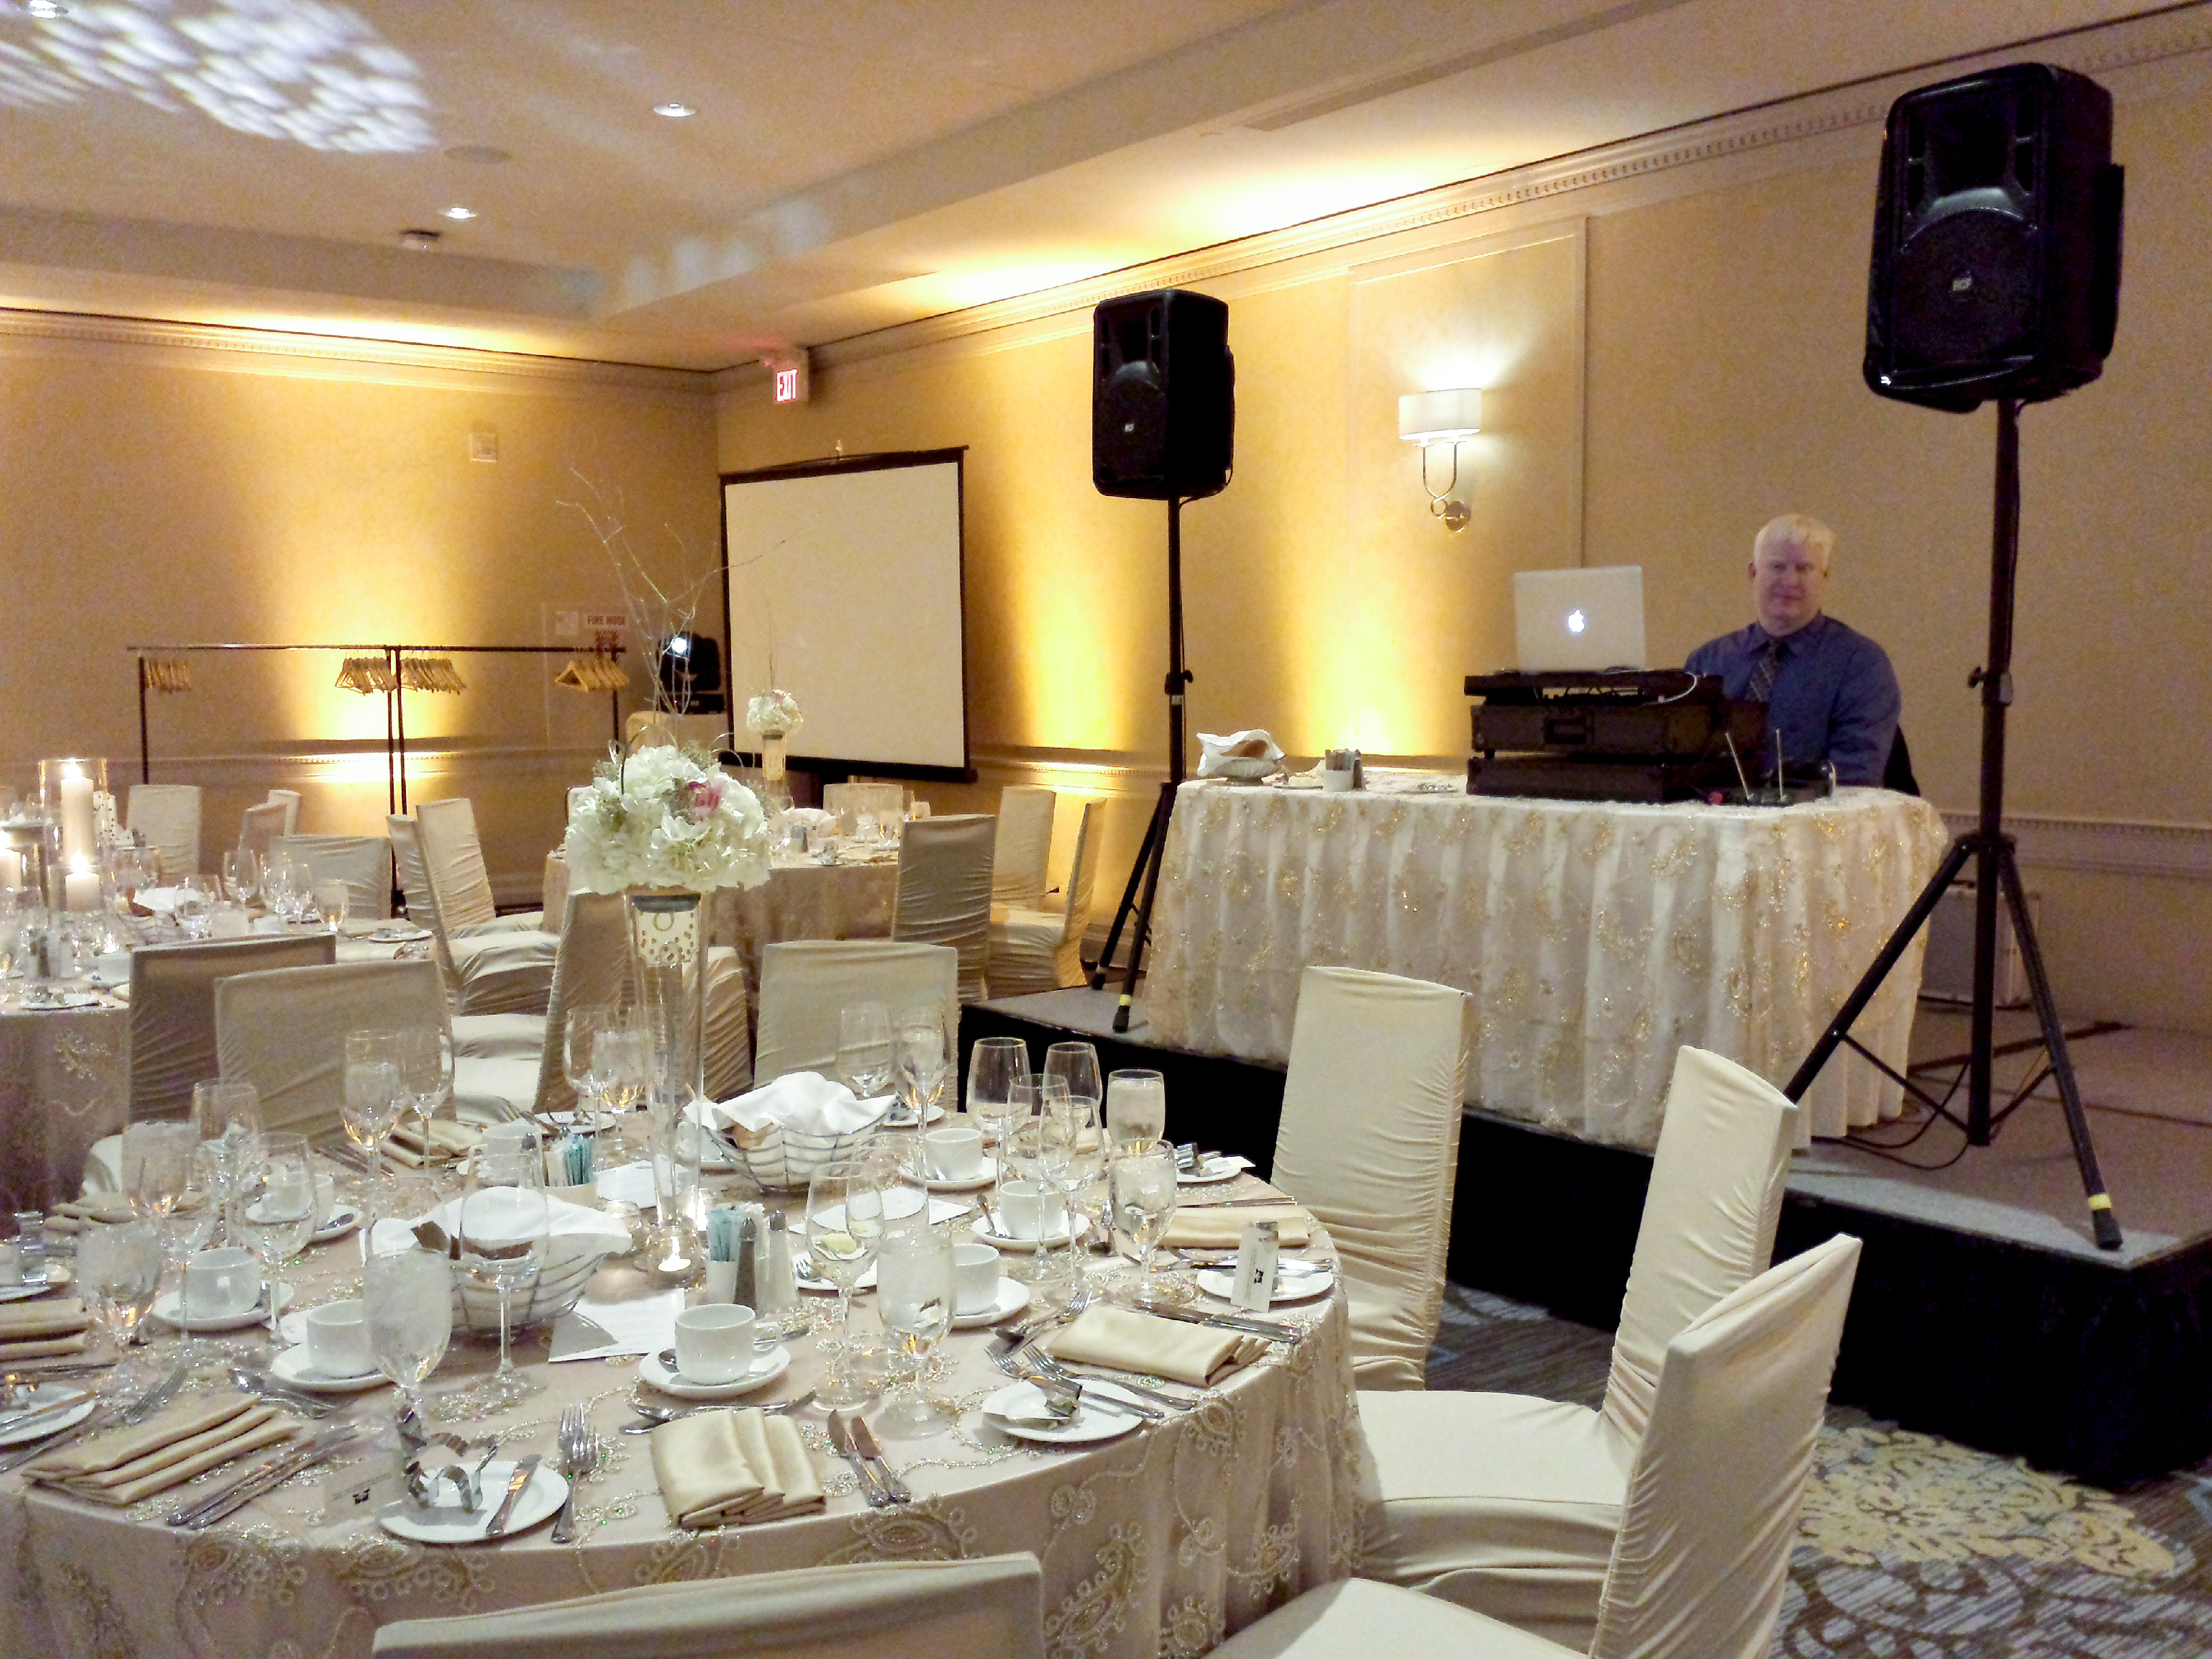 DJ Vito at a wedding reception